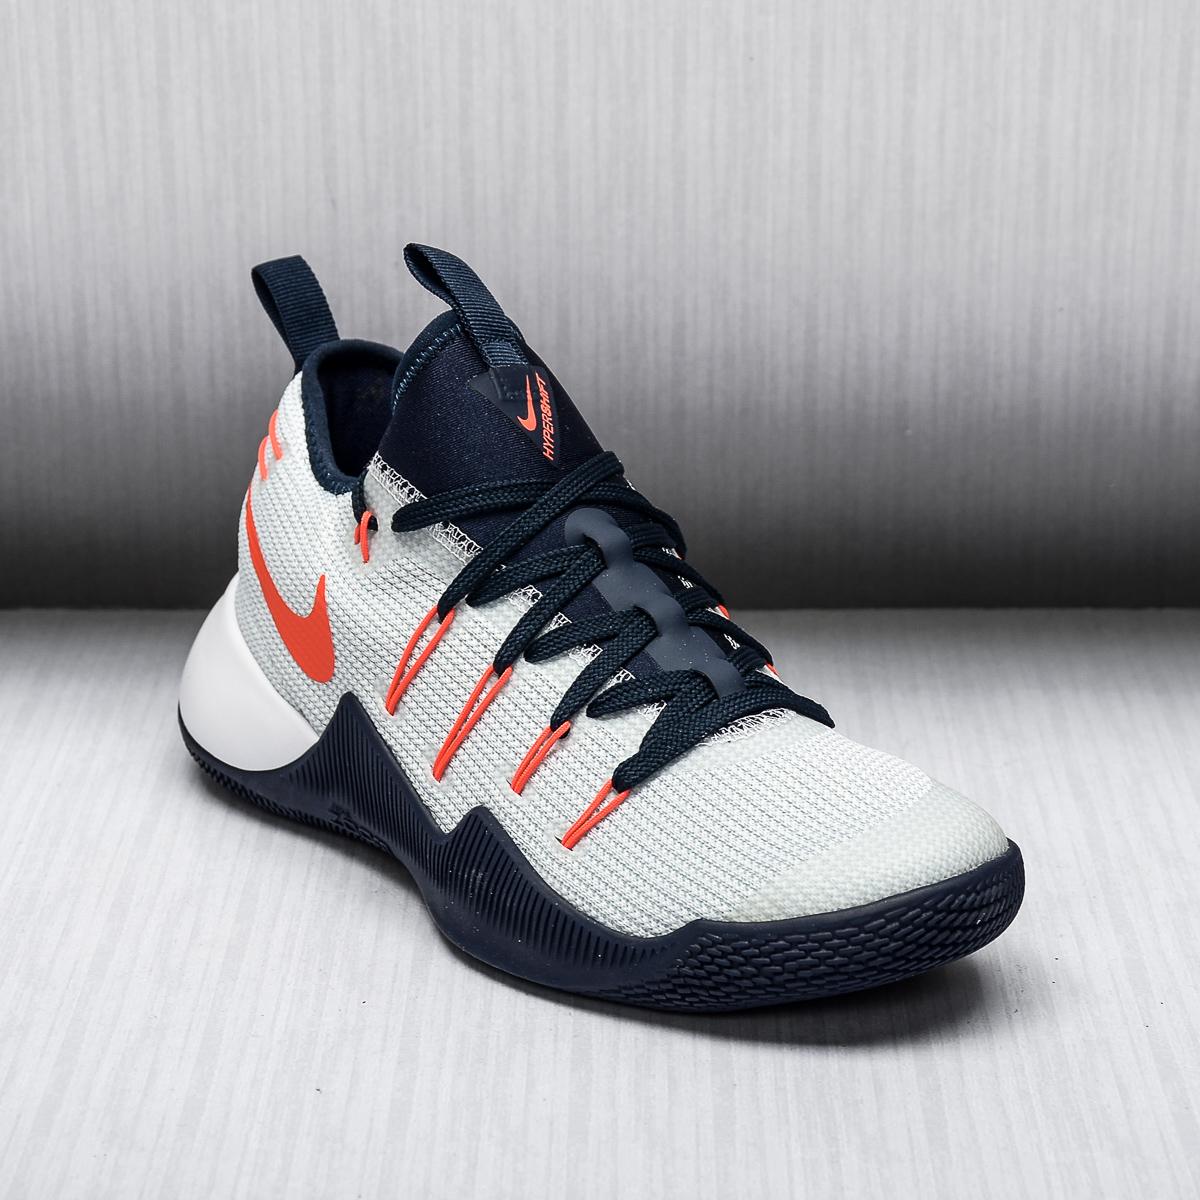 Nike Hypershift USA Basketball Shoes - BASKETBALL SHOES ...